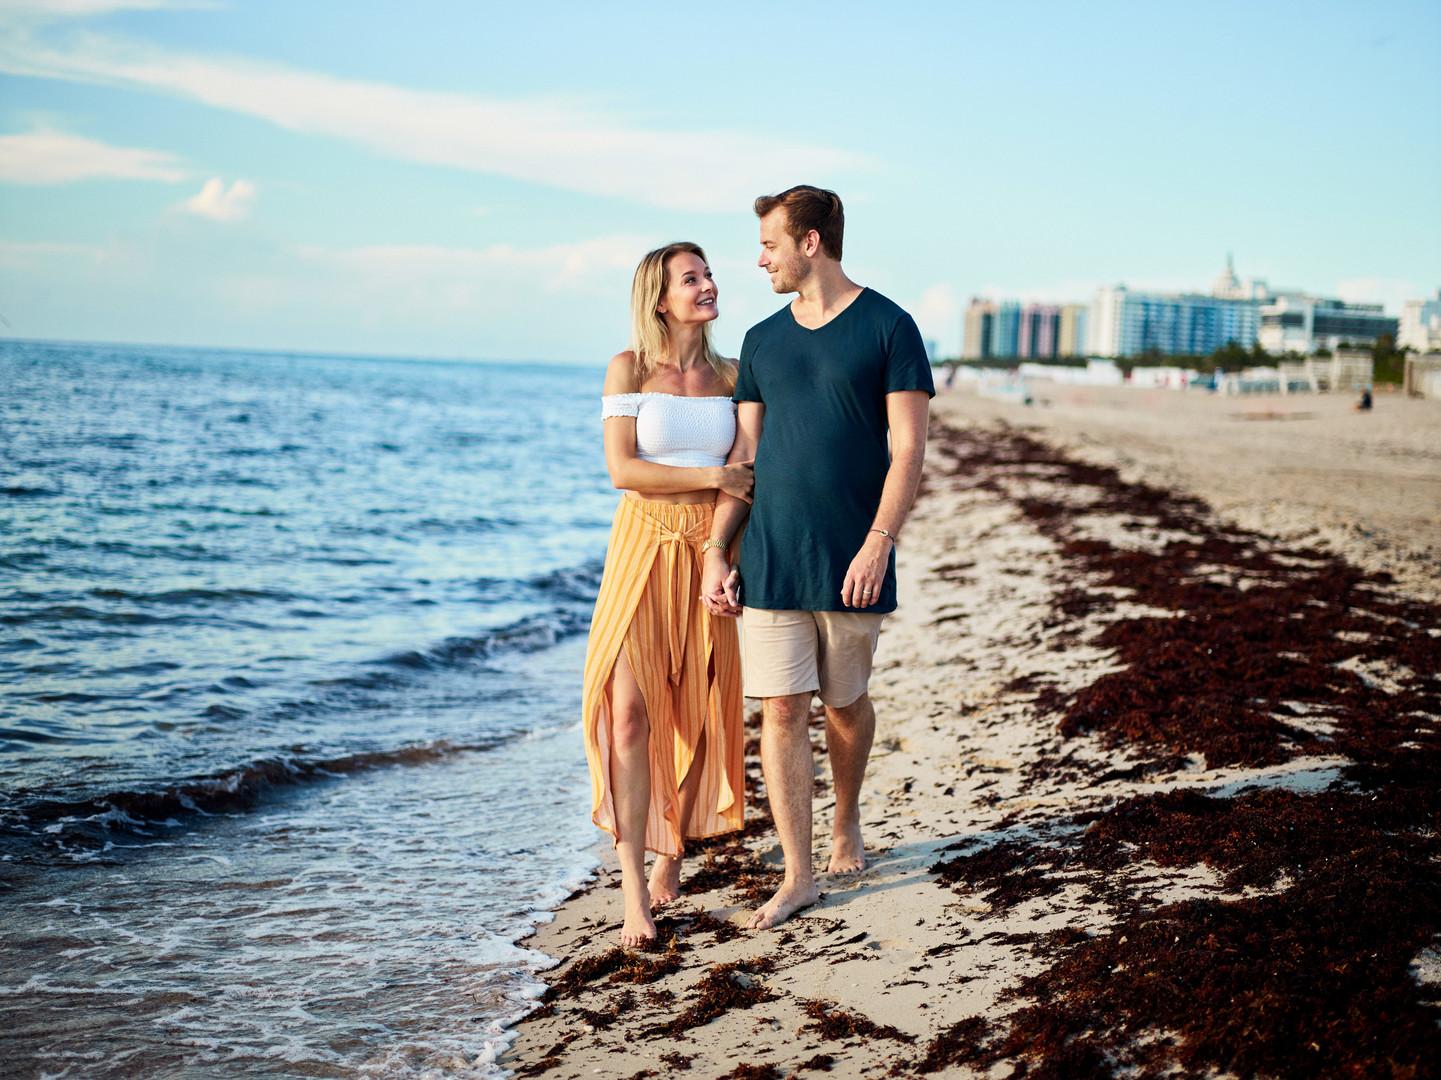 Como Metropolitan Miami Beach Engagement Session: Emelie & Peter